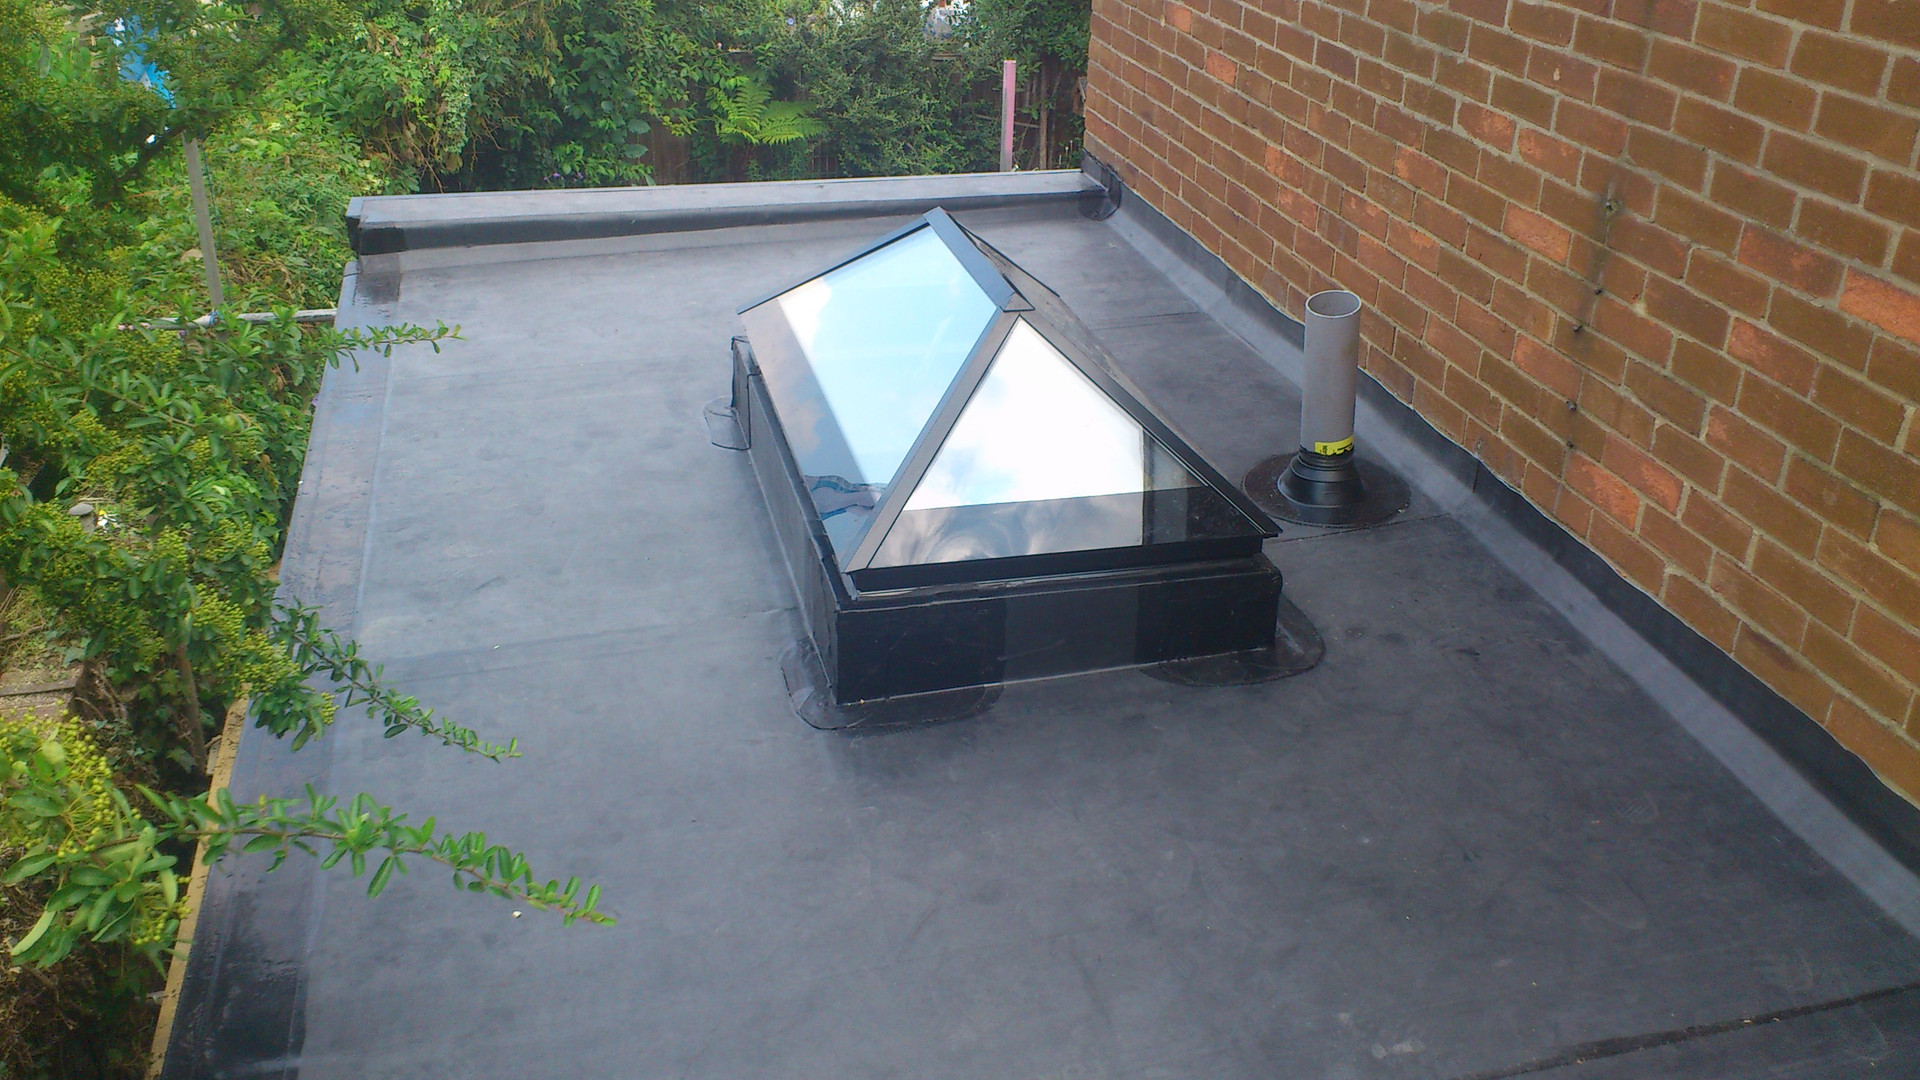 Jamie-Sutton-flat-roof.jpg